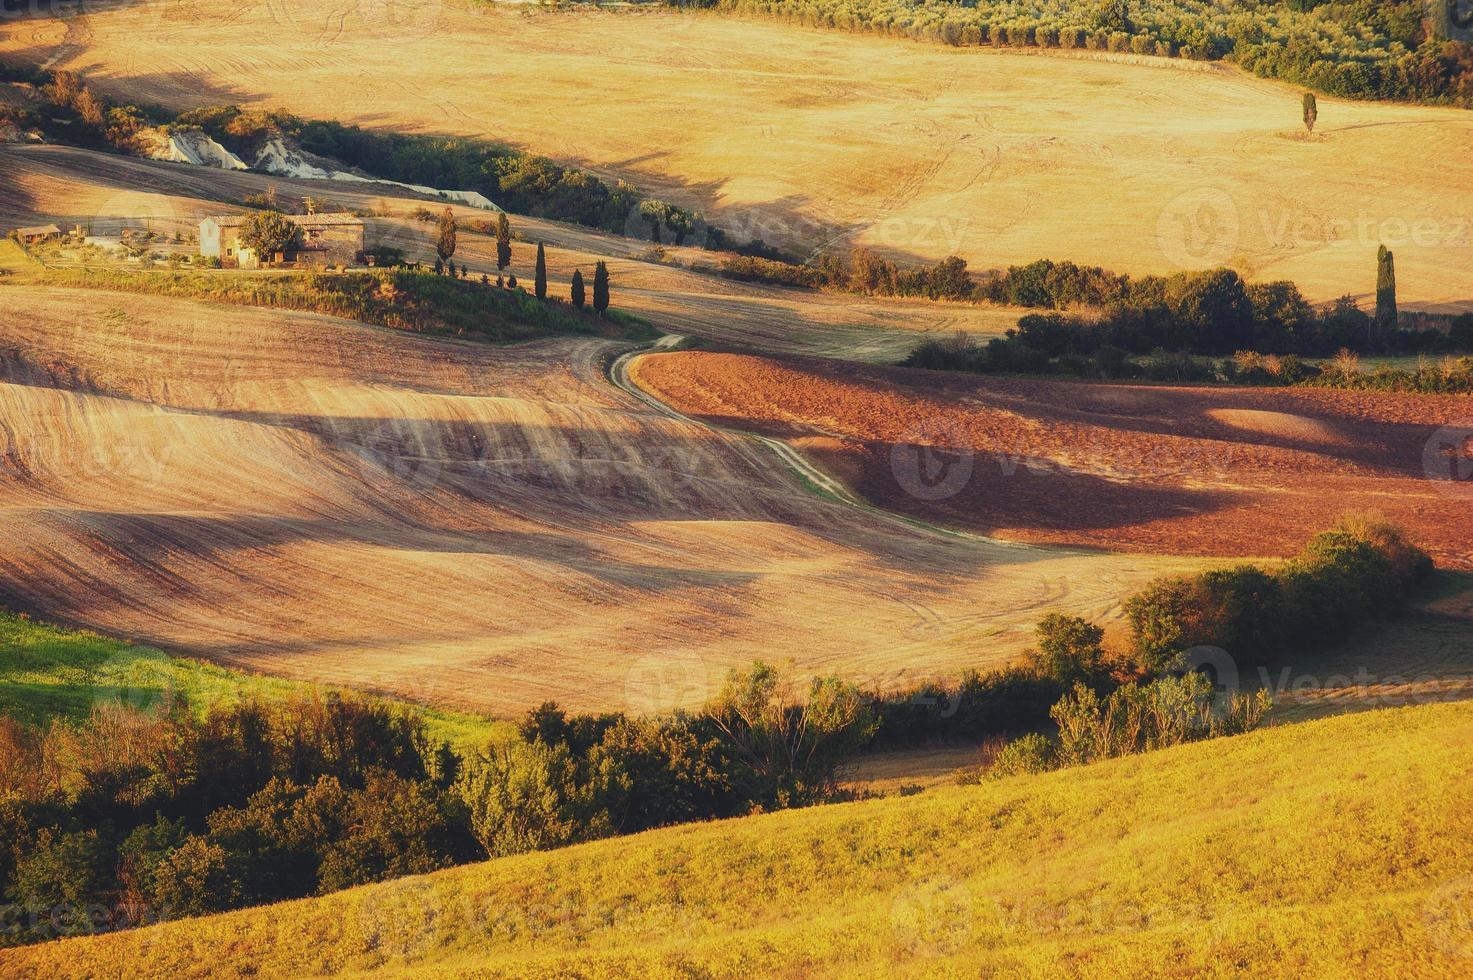 paisaje rural a la luz del atardecer. foto